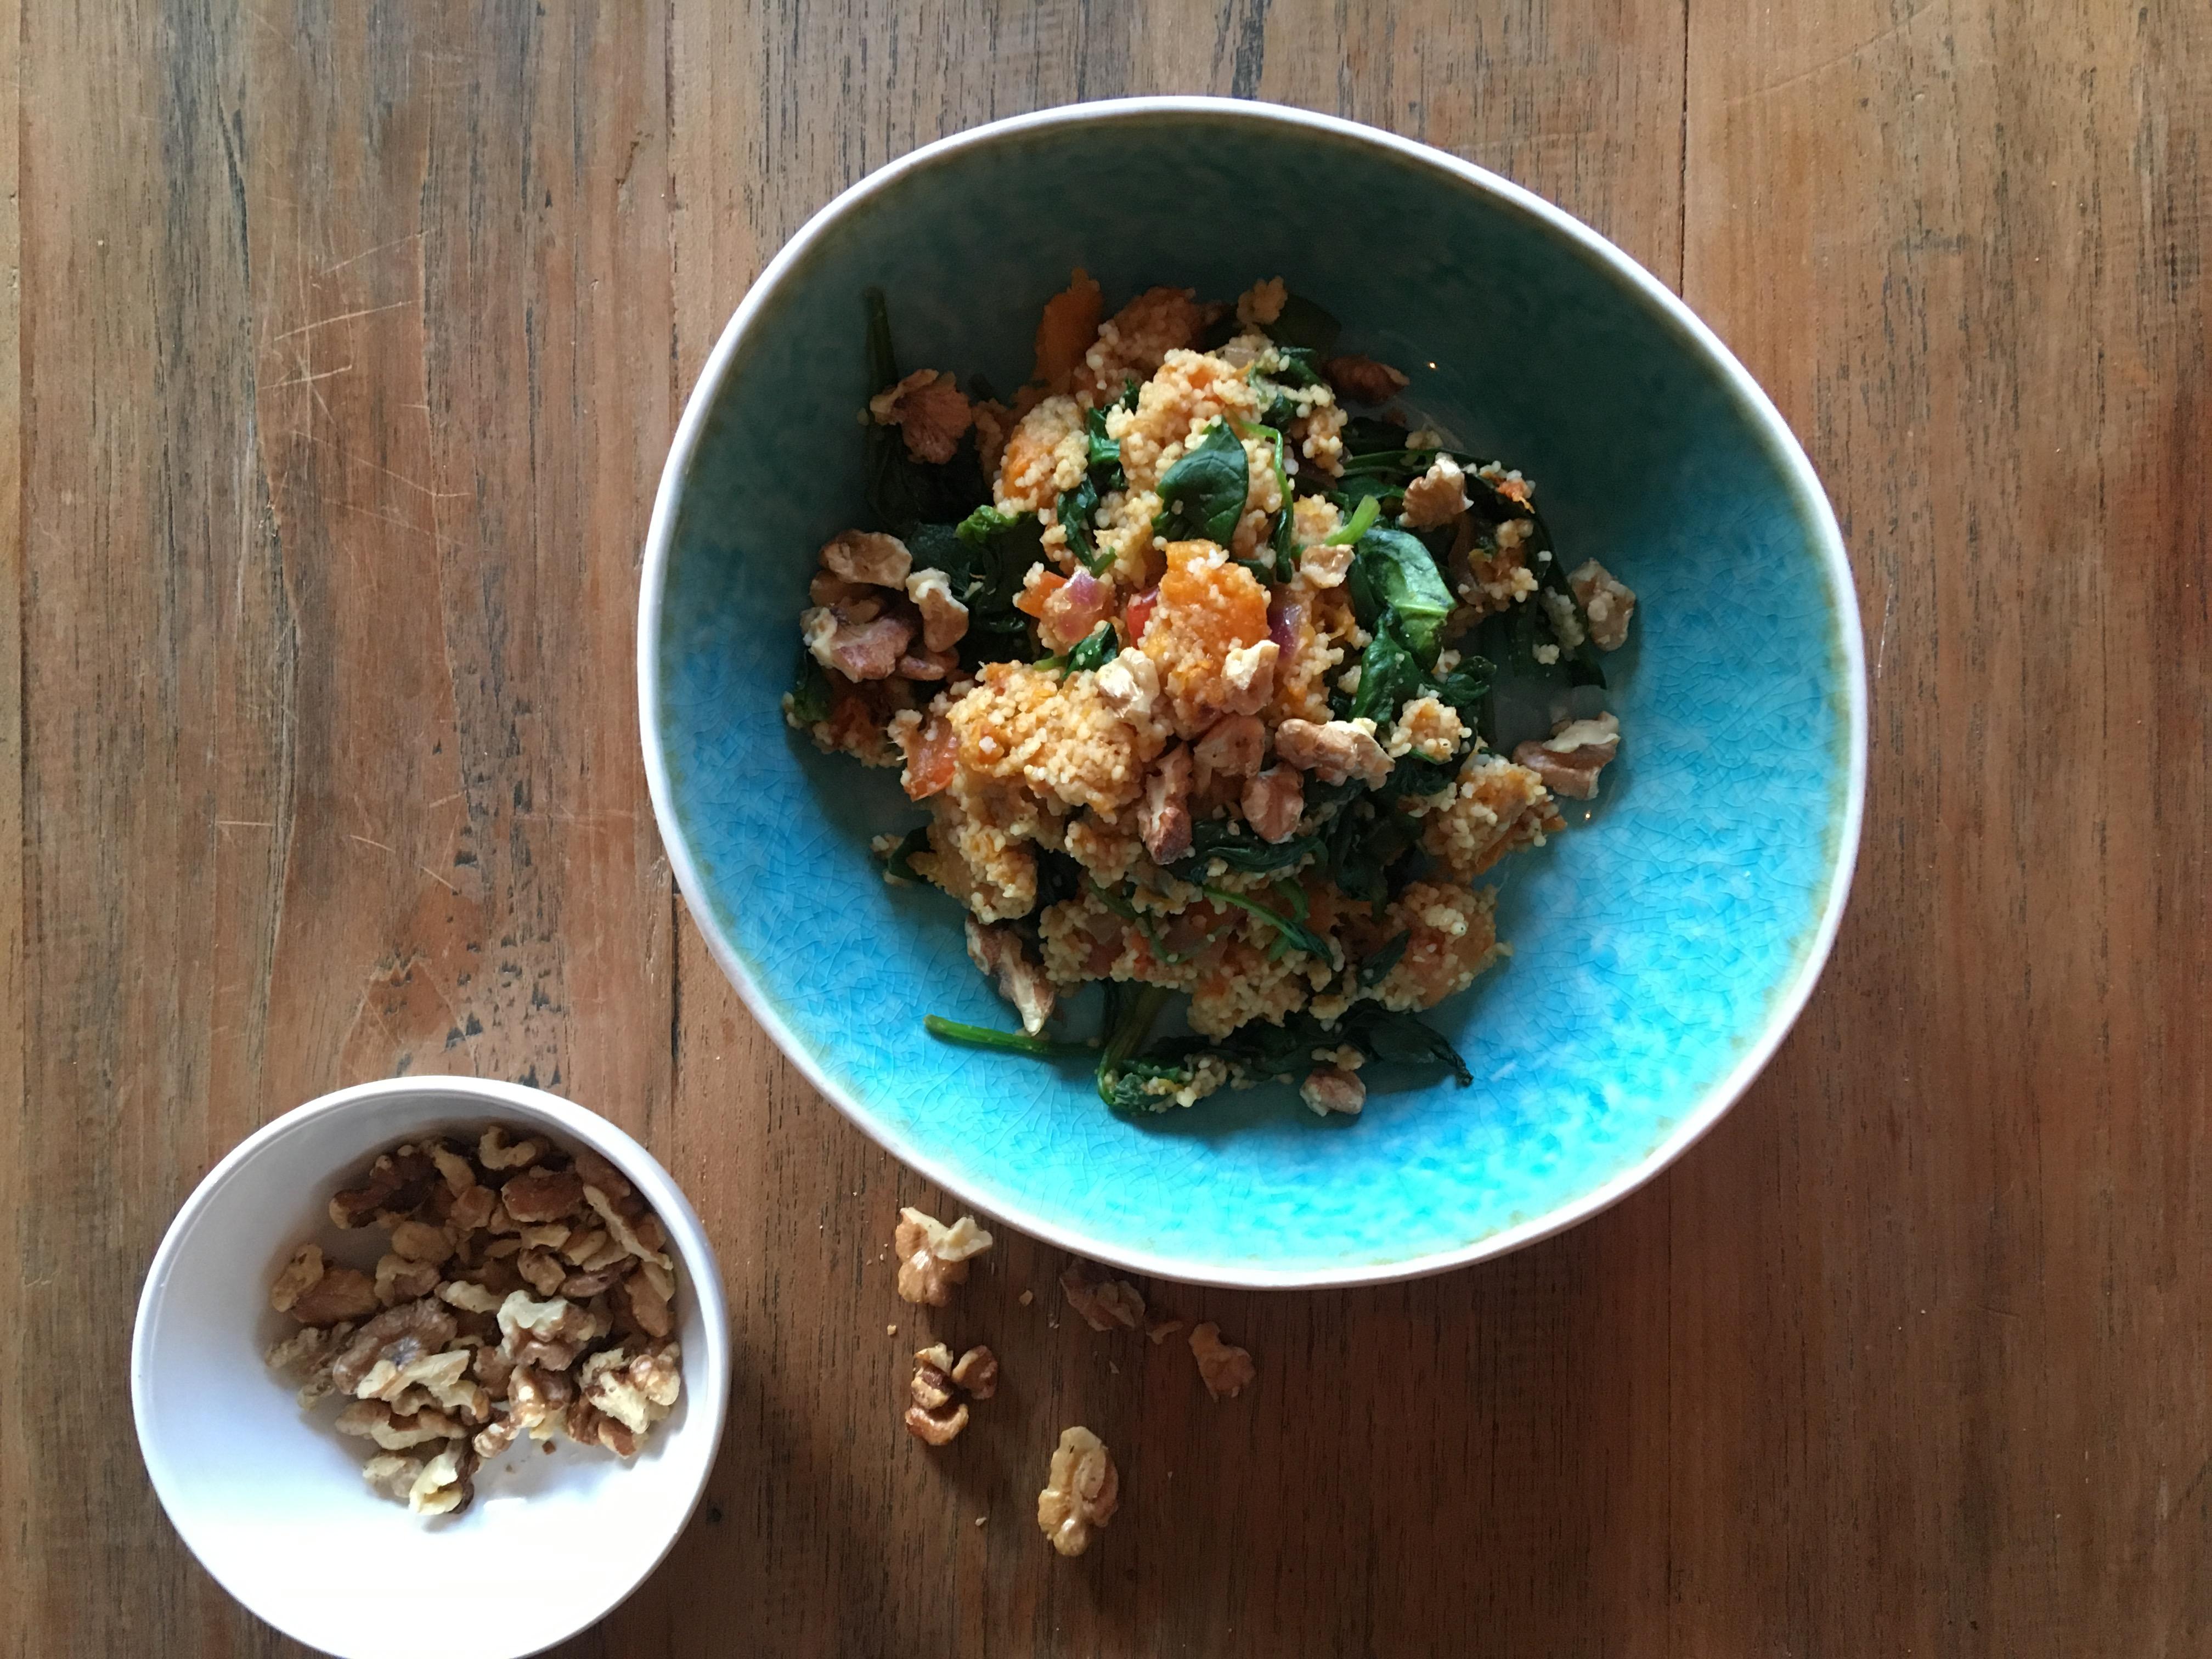 Bloemkoolcouscous met pompoen, spinazie en kruidige yoghurt